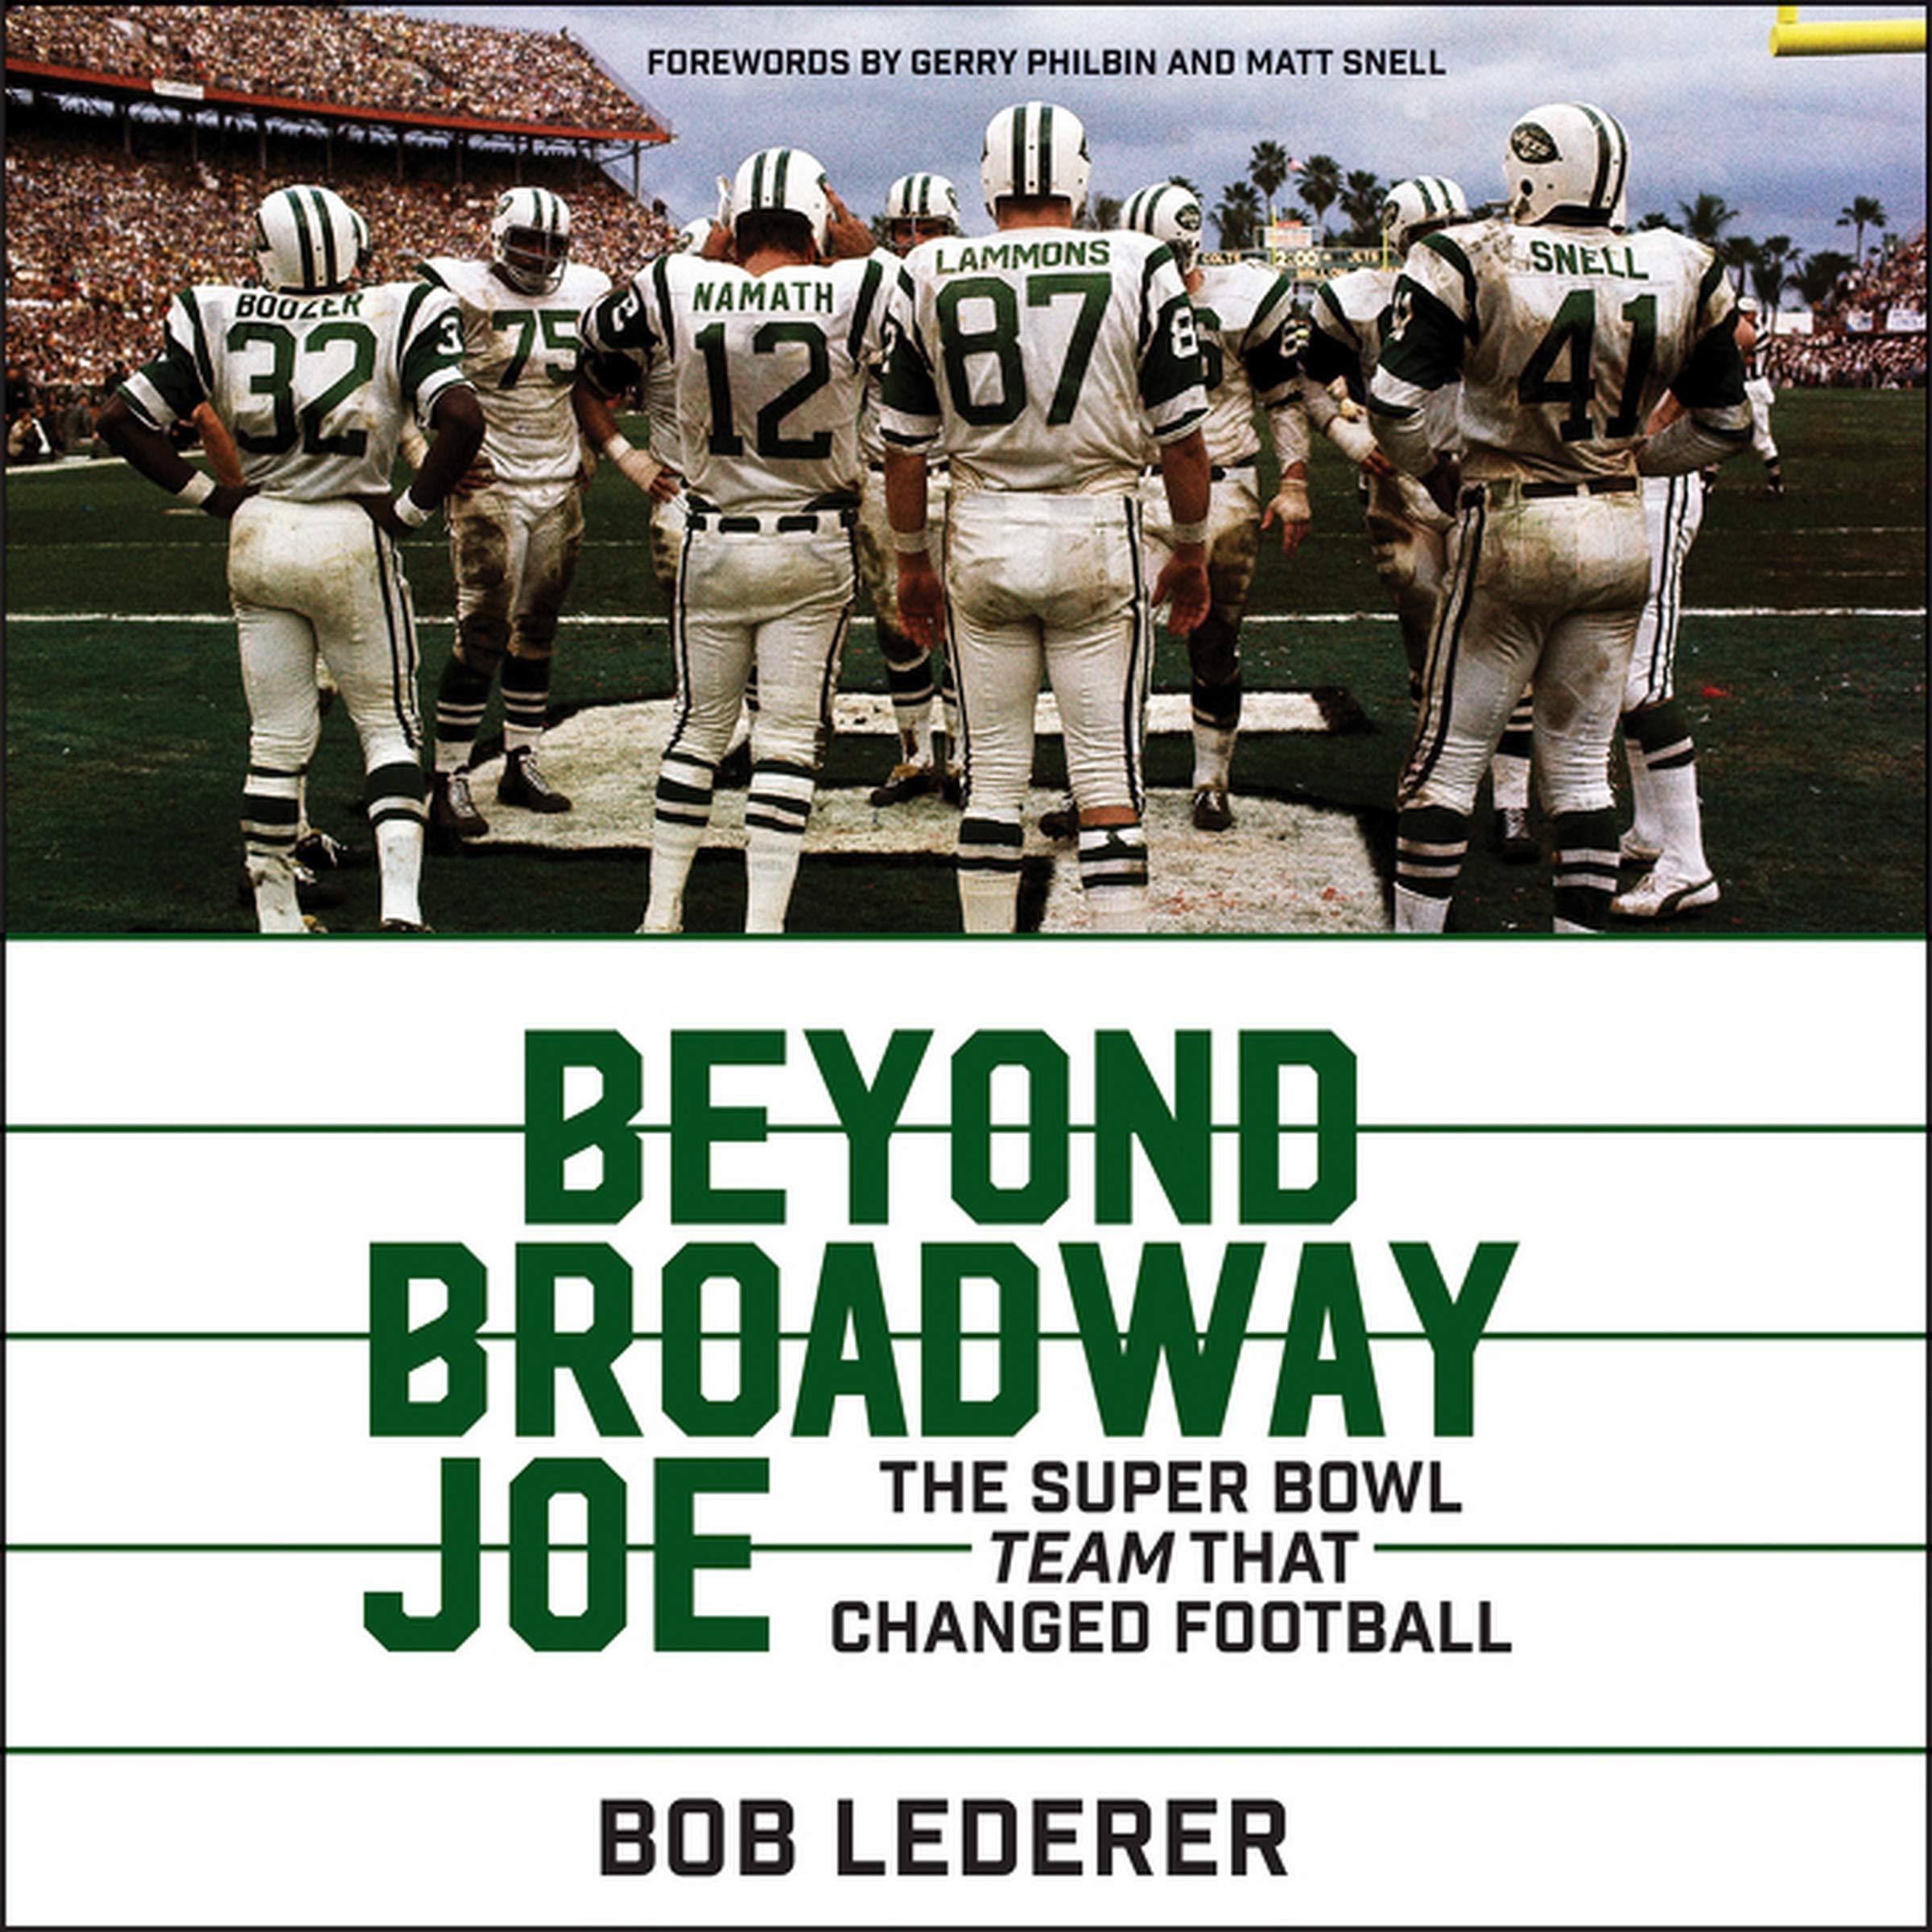 Beyond Broadway Joe: The Super Bowl TEAM That Changed Football